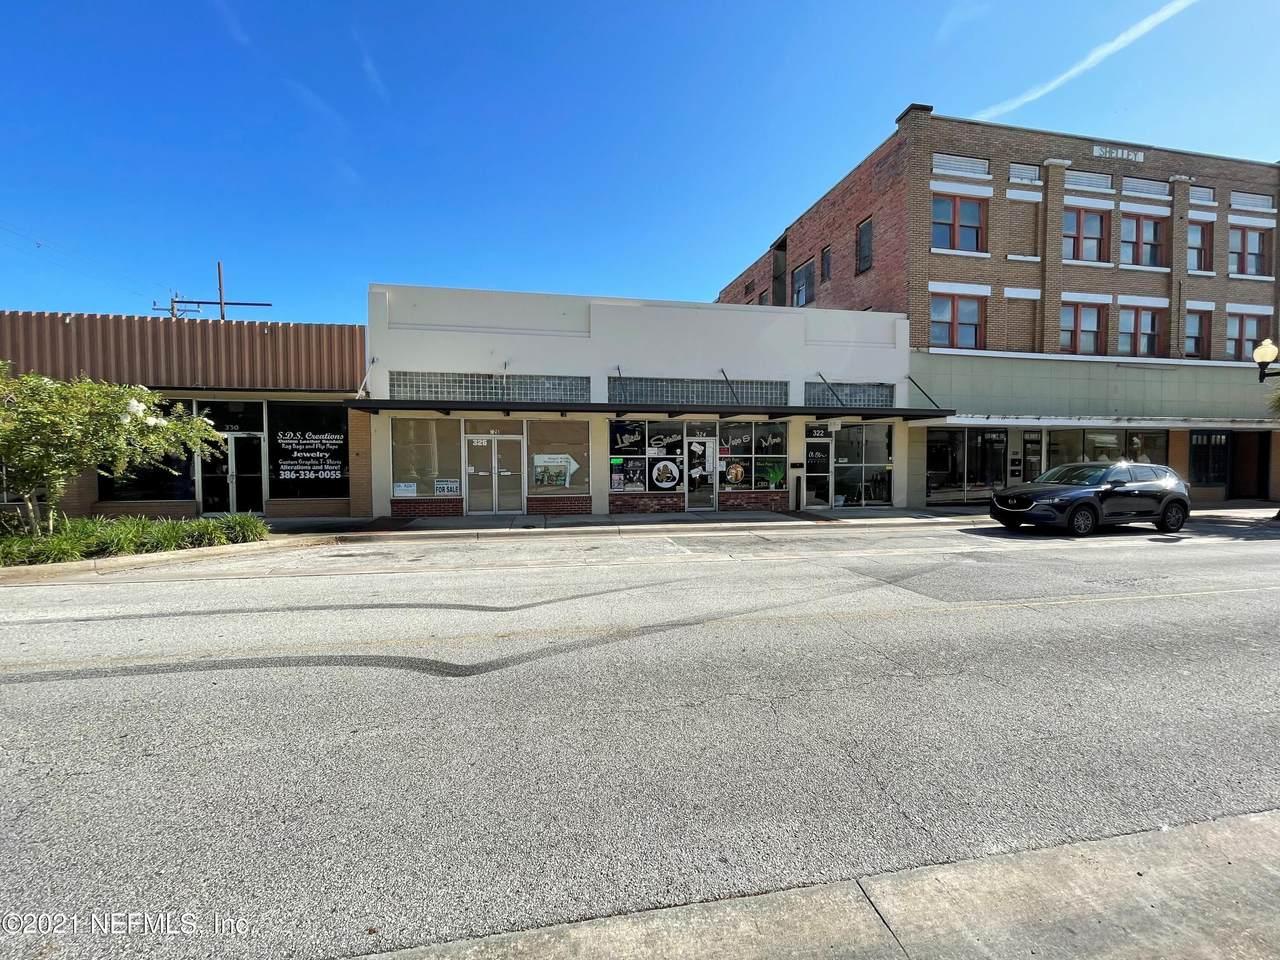 326 St Johns Ave - Photo 1